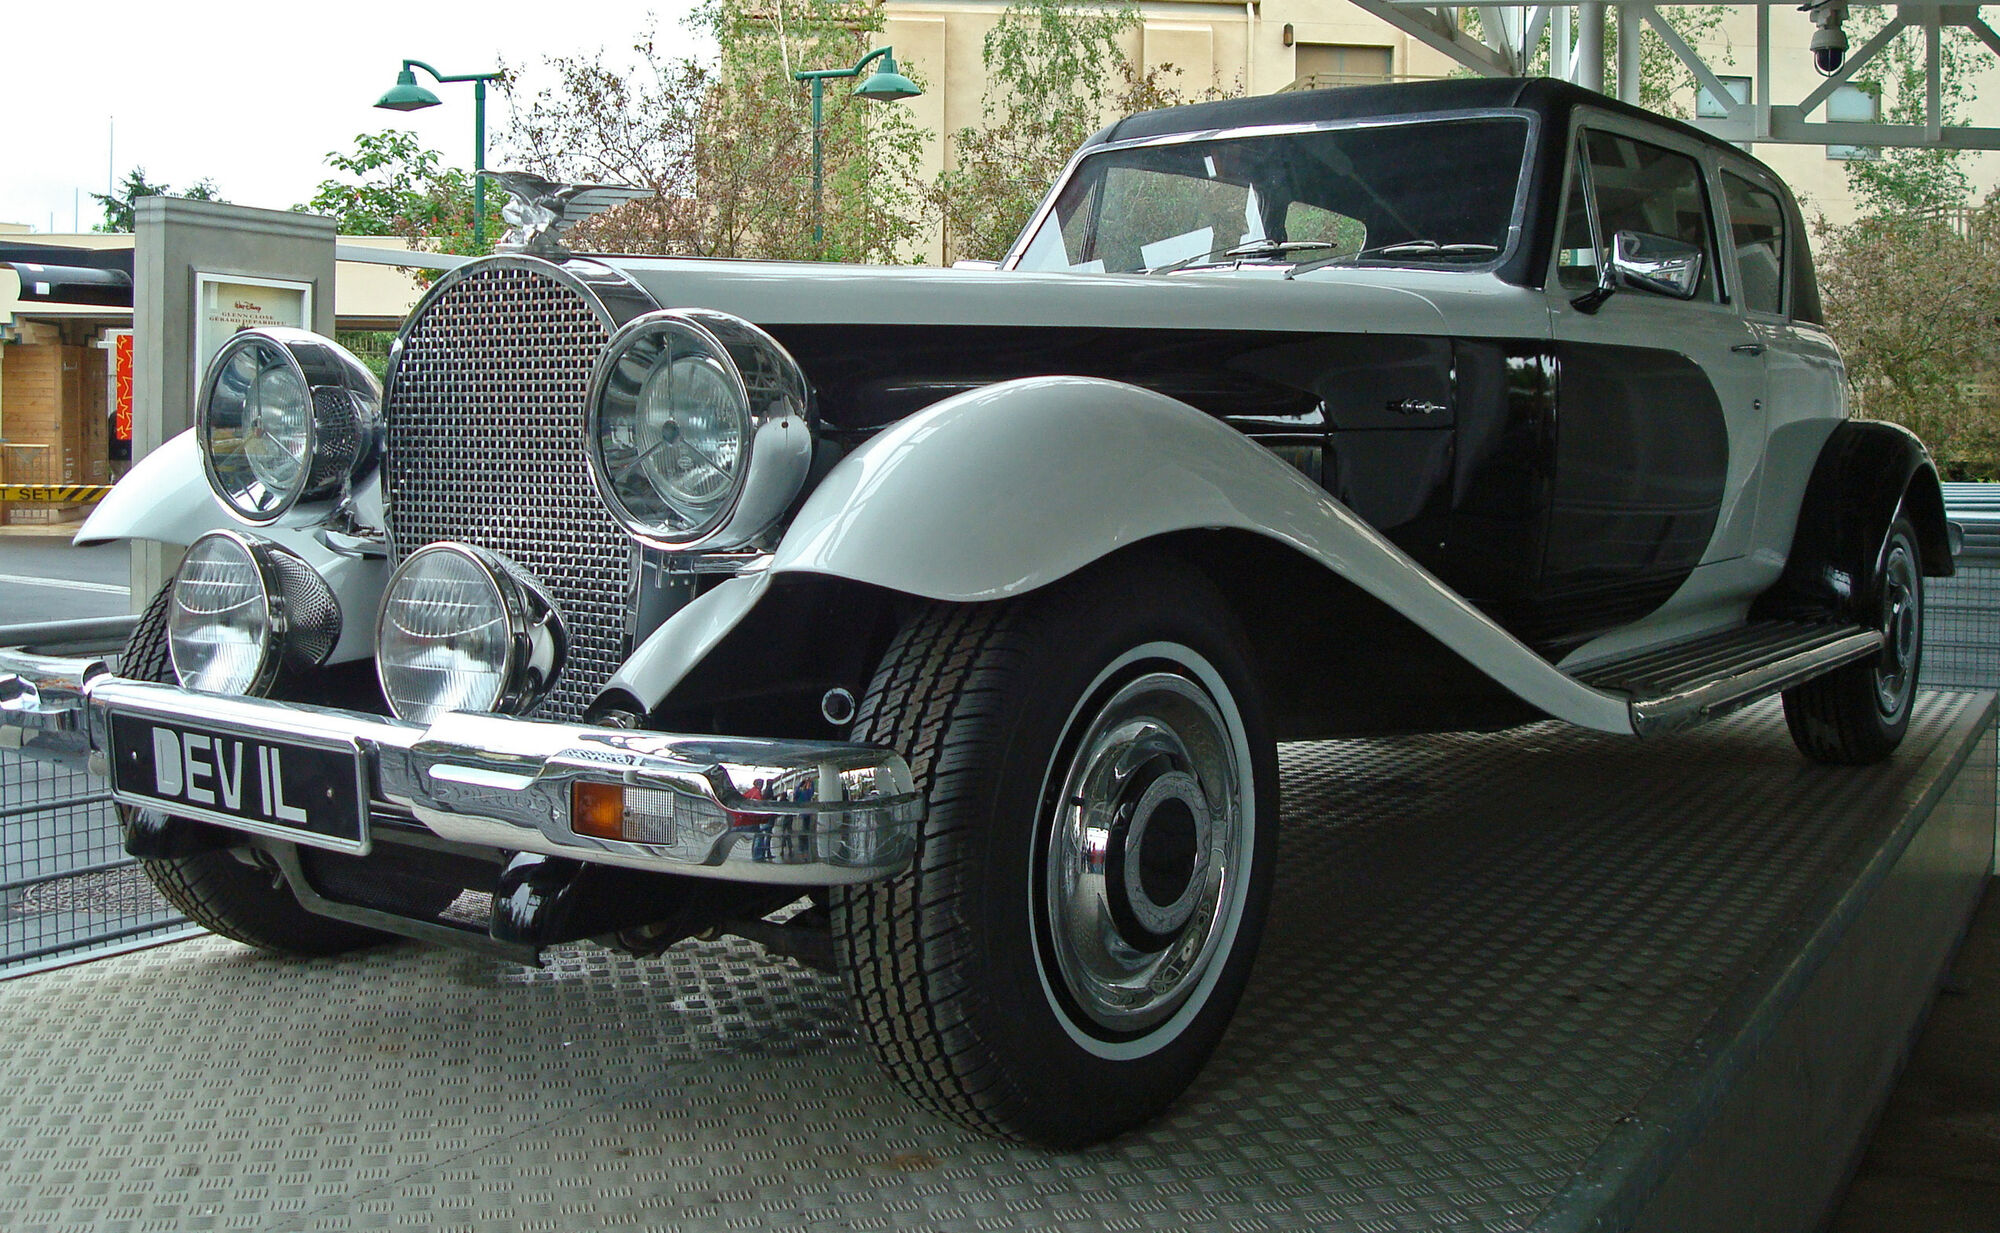 Cruella's car | 101 Dalmatians Wiki | Fandom powered by Wikia Cruella Deville Car Disney